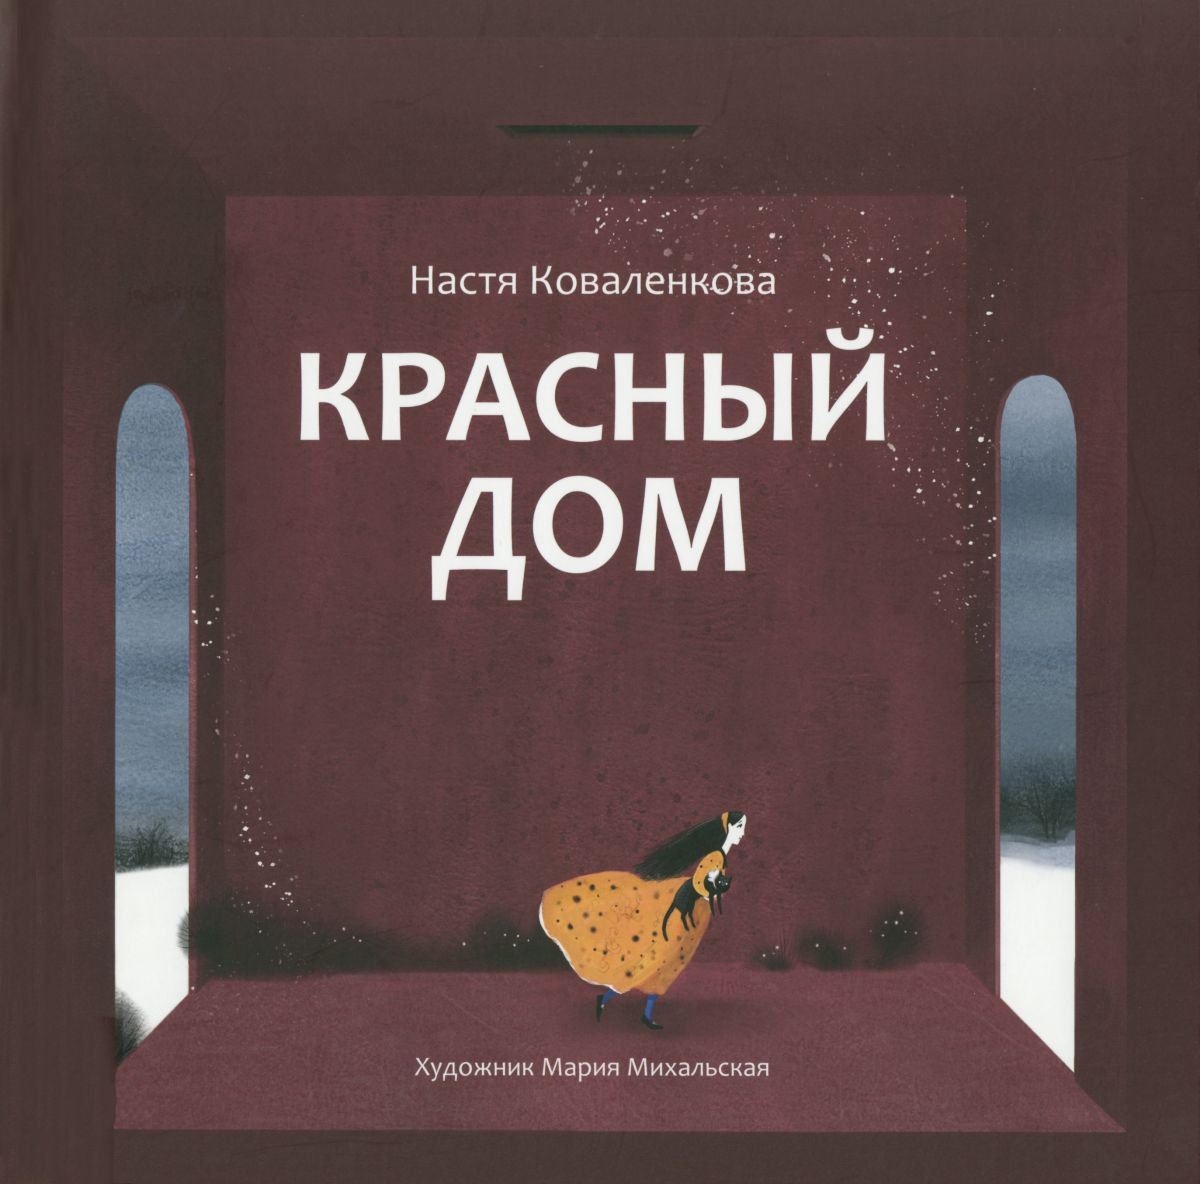 Krasnyj dom. Ballada (Das rote Hause. Eine Ballade) Book Cover